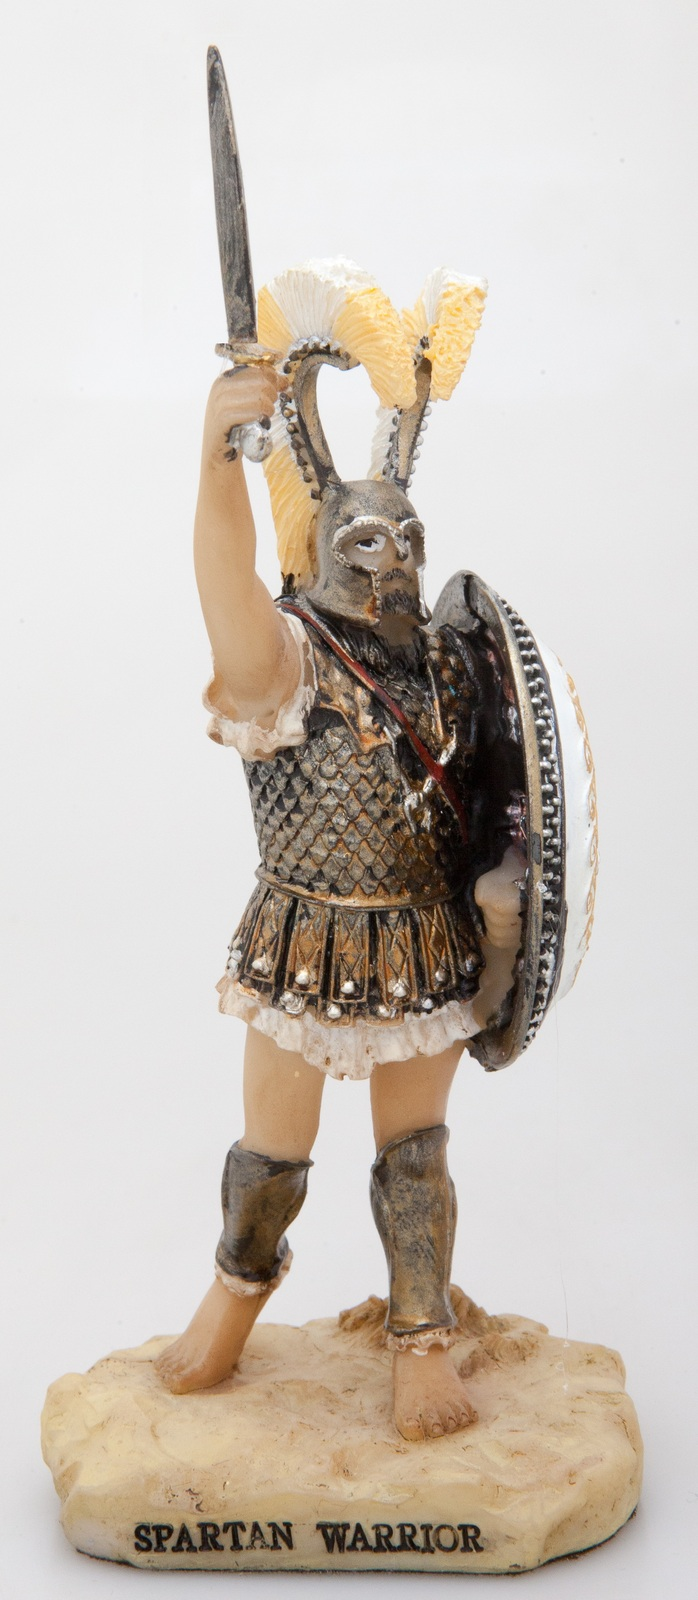 Ancient Greek Museum Statue Replica of Spartan Warrior Figurine Decor - $33.81